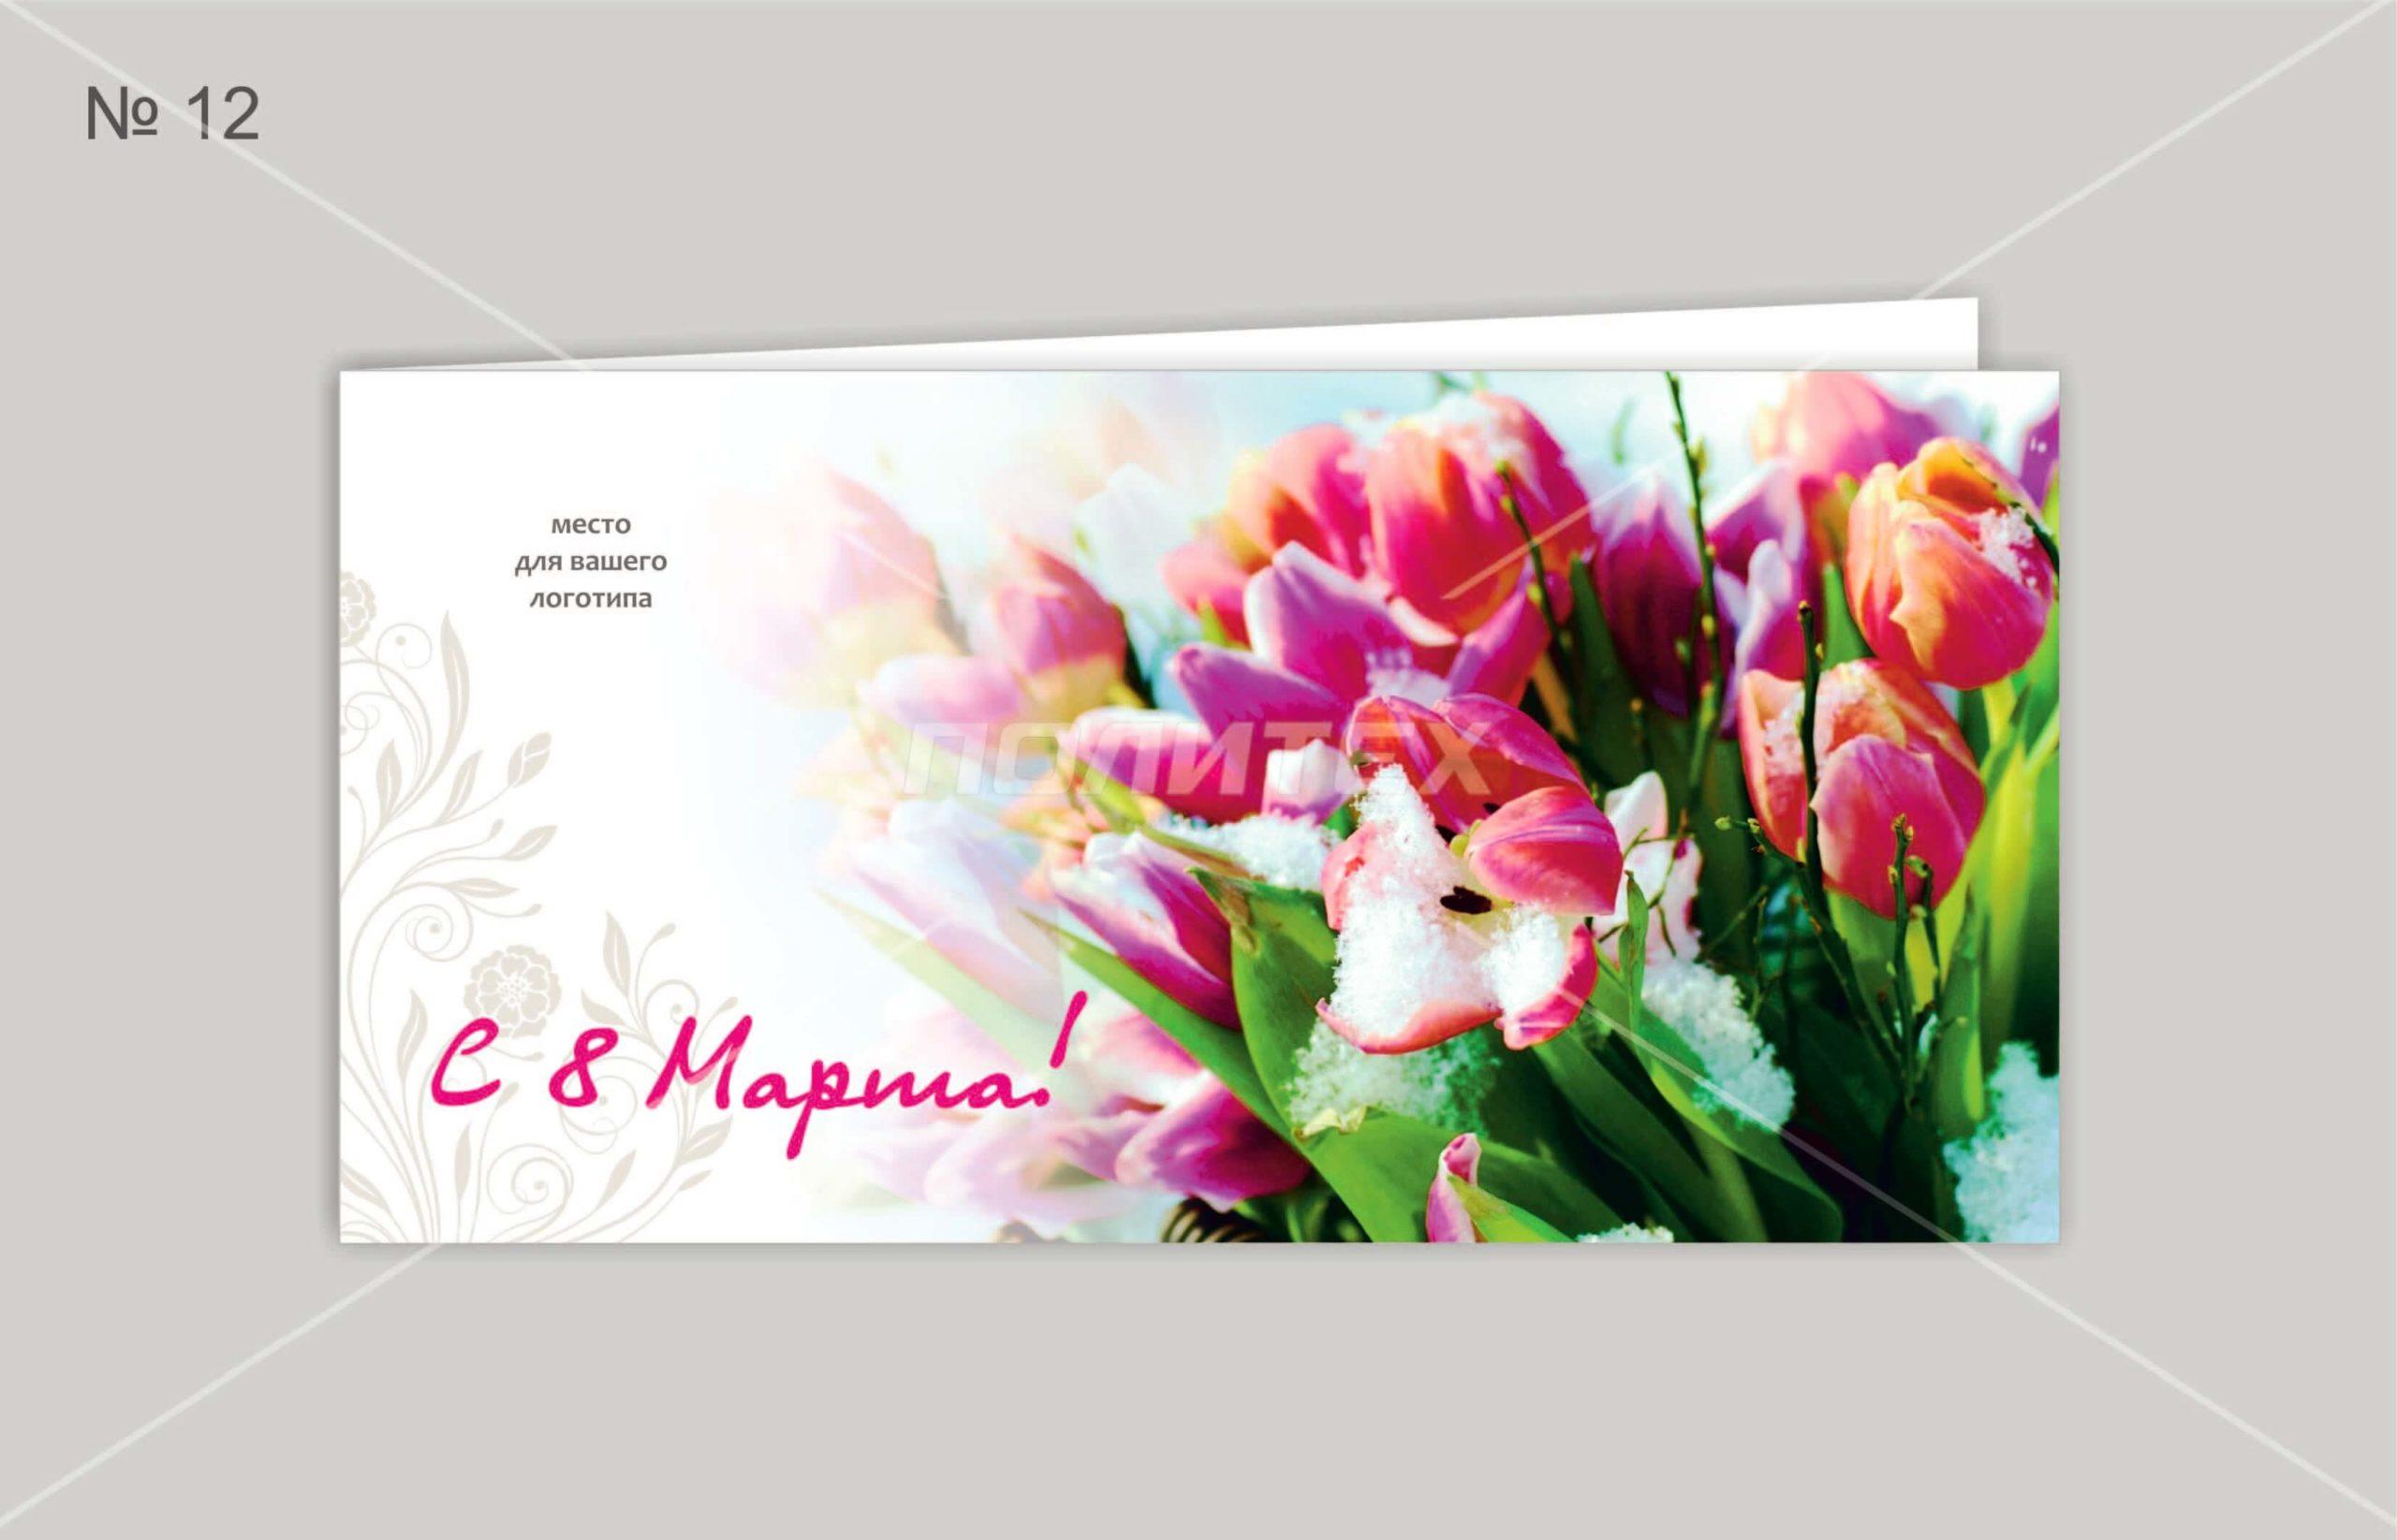 Корпоративные открытки с логотипом 8 марта